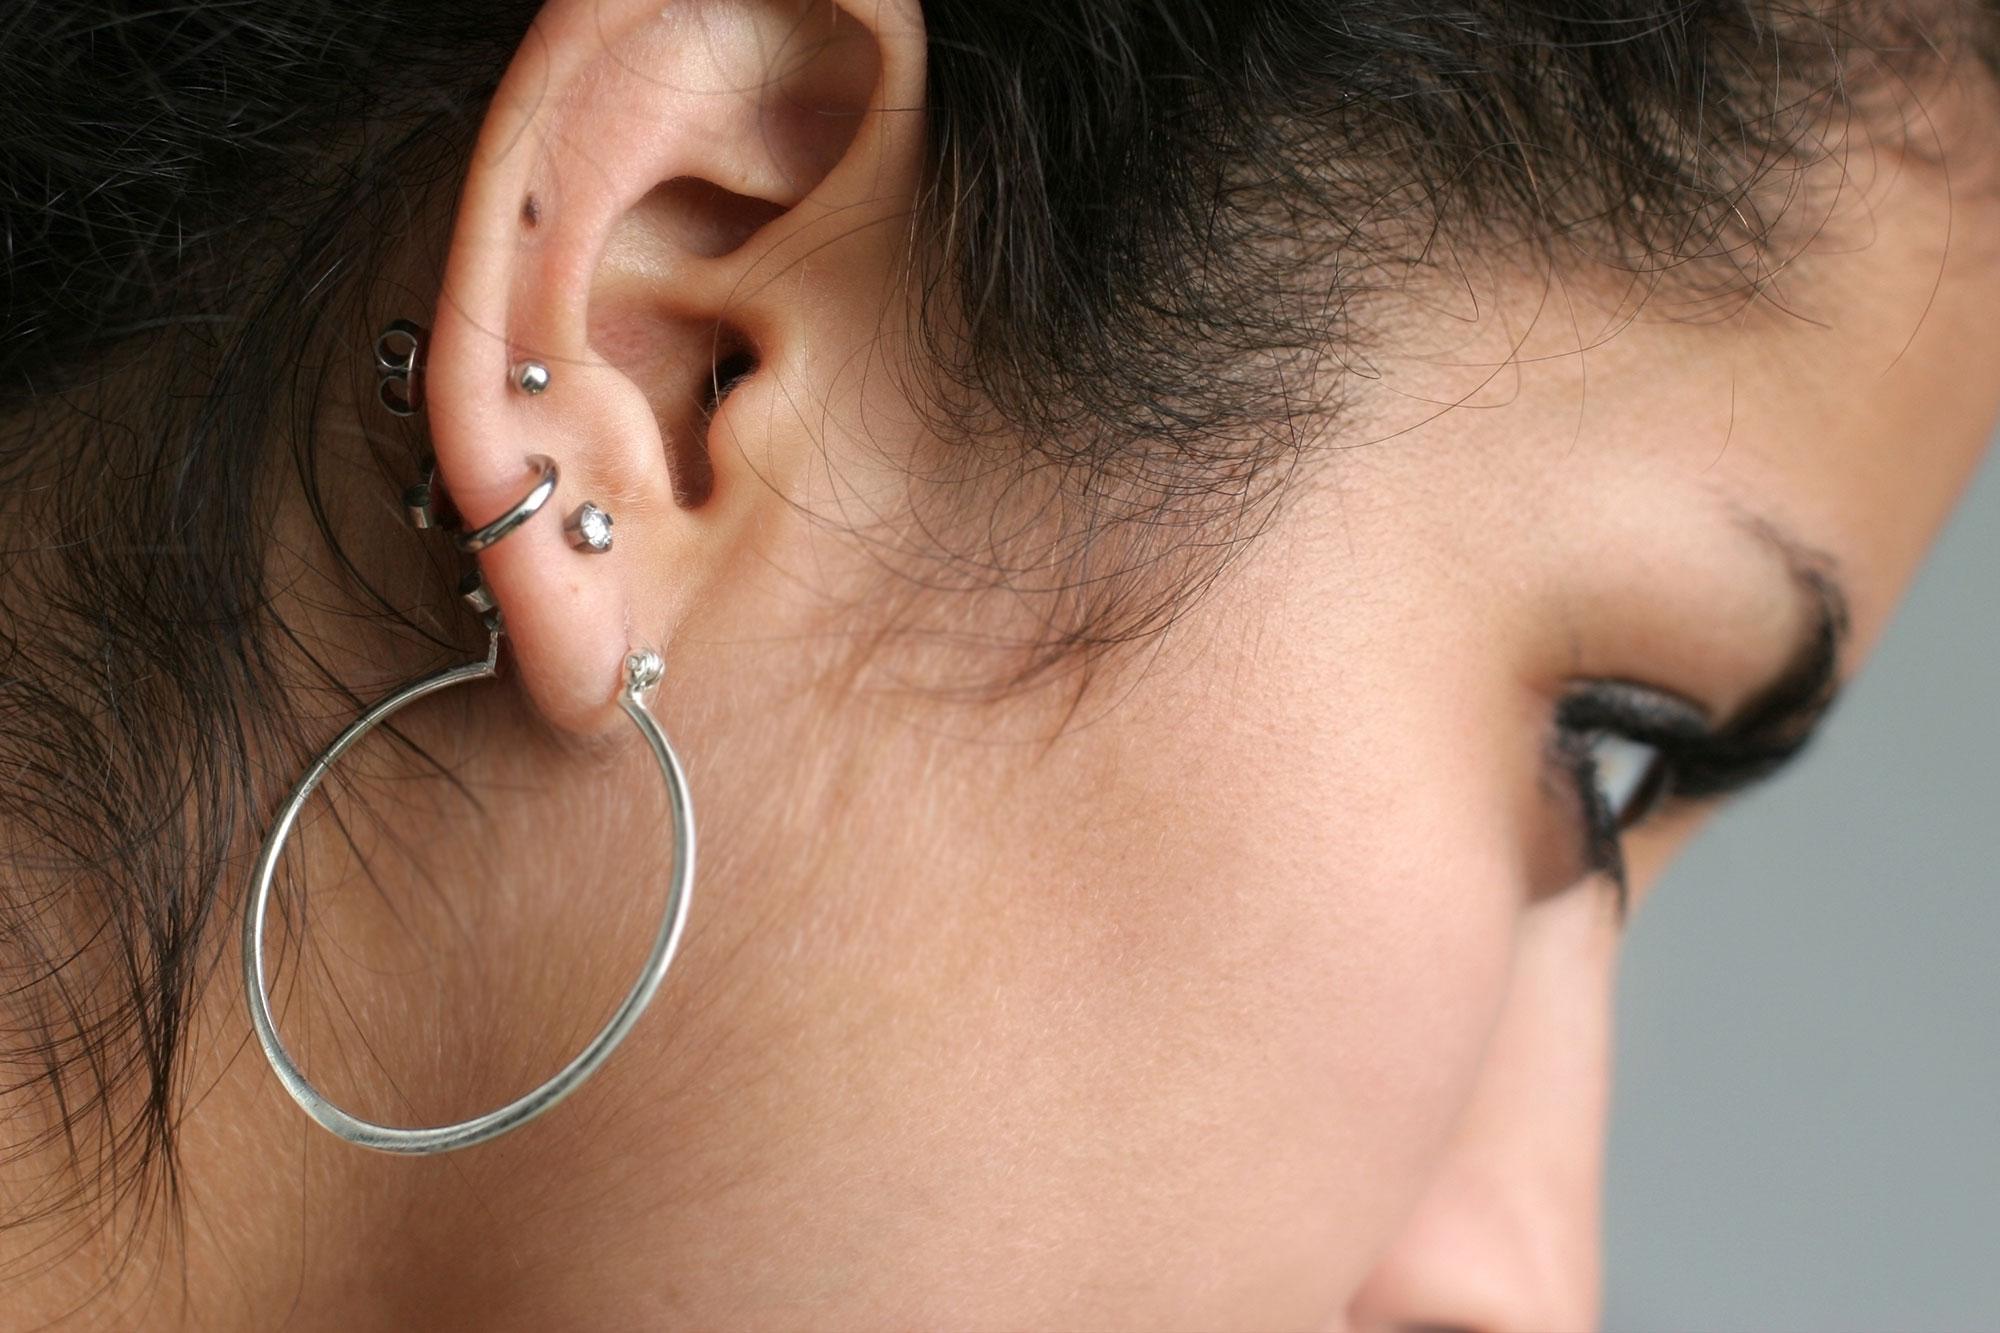 Multi Piercing